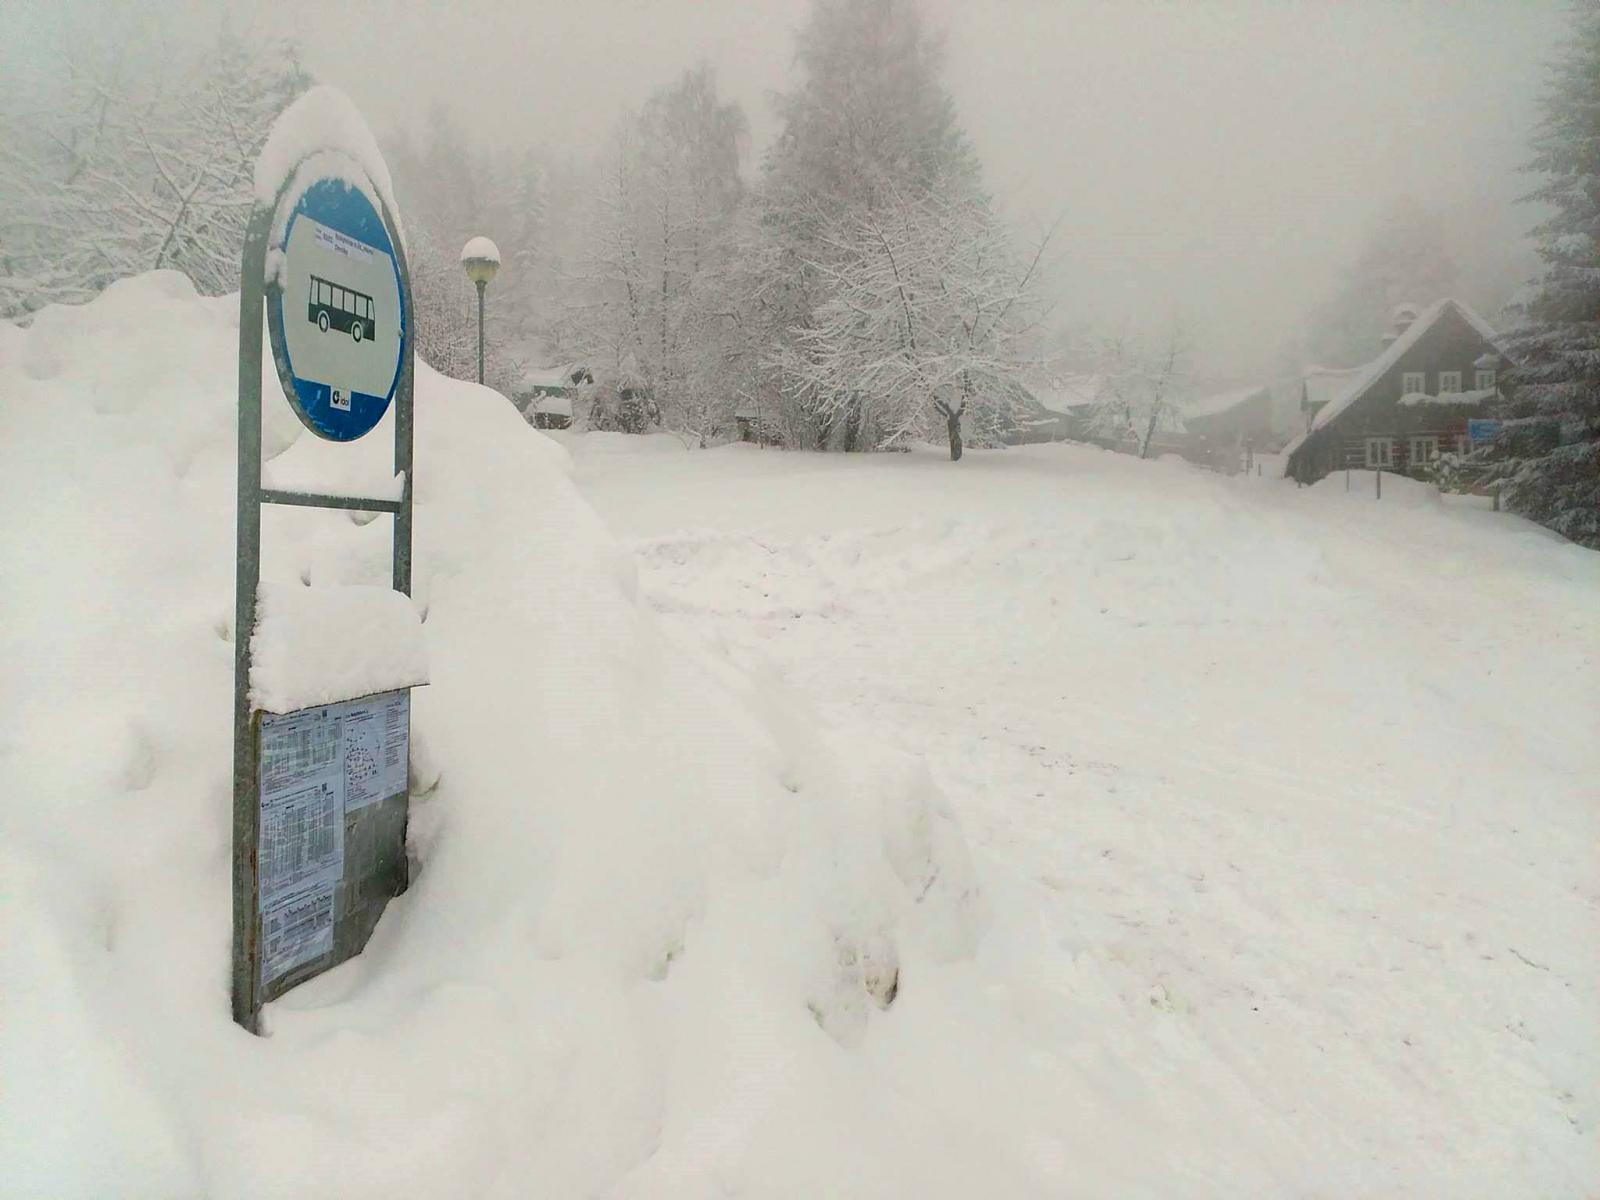 Zapadaná autobusová zastávka